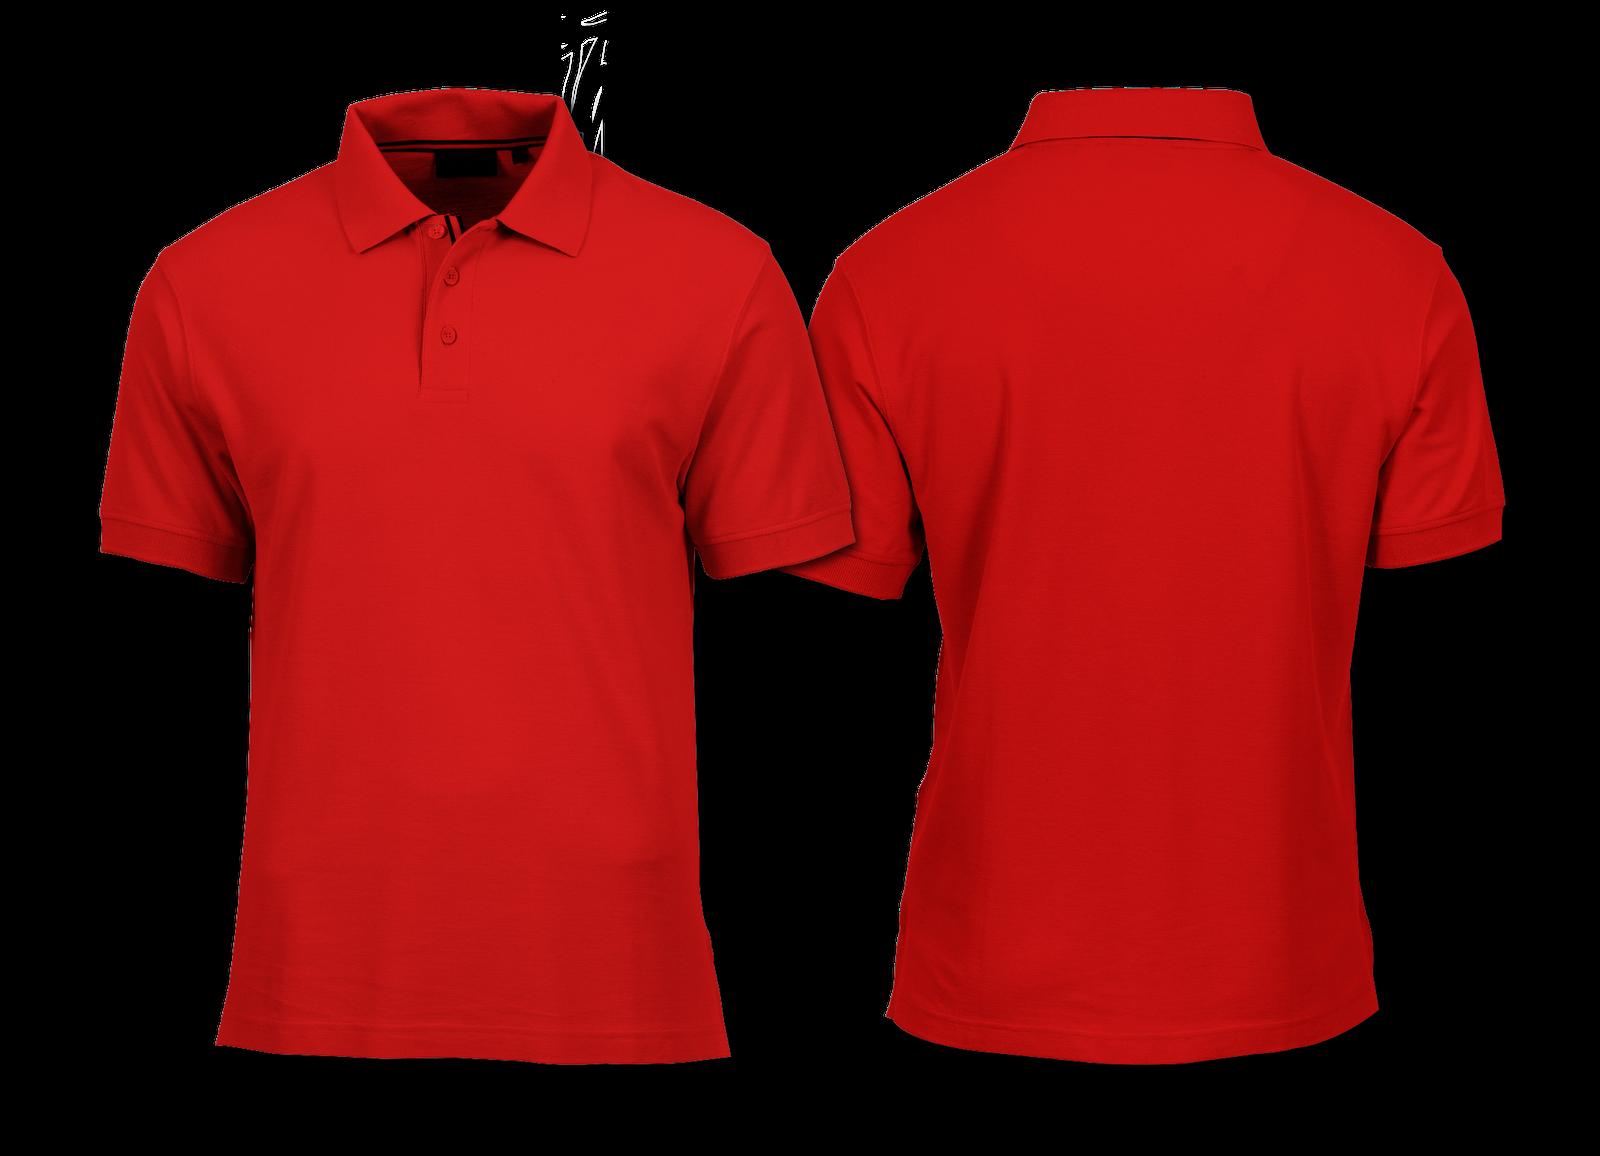 29 Polo Shirt Desain Baju Polos Warna Navy